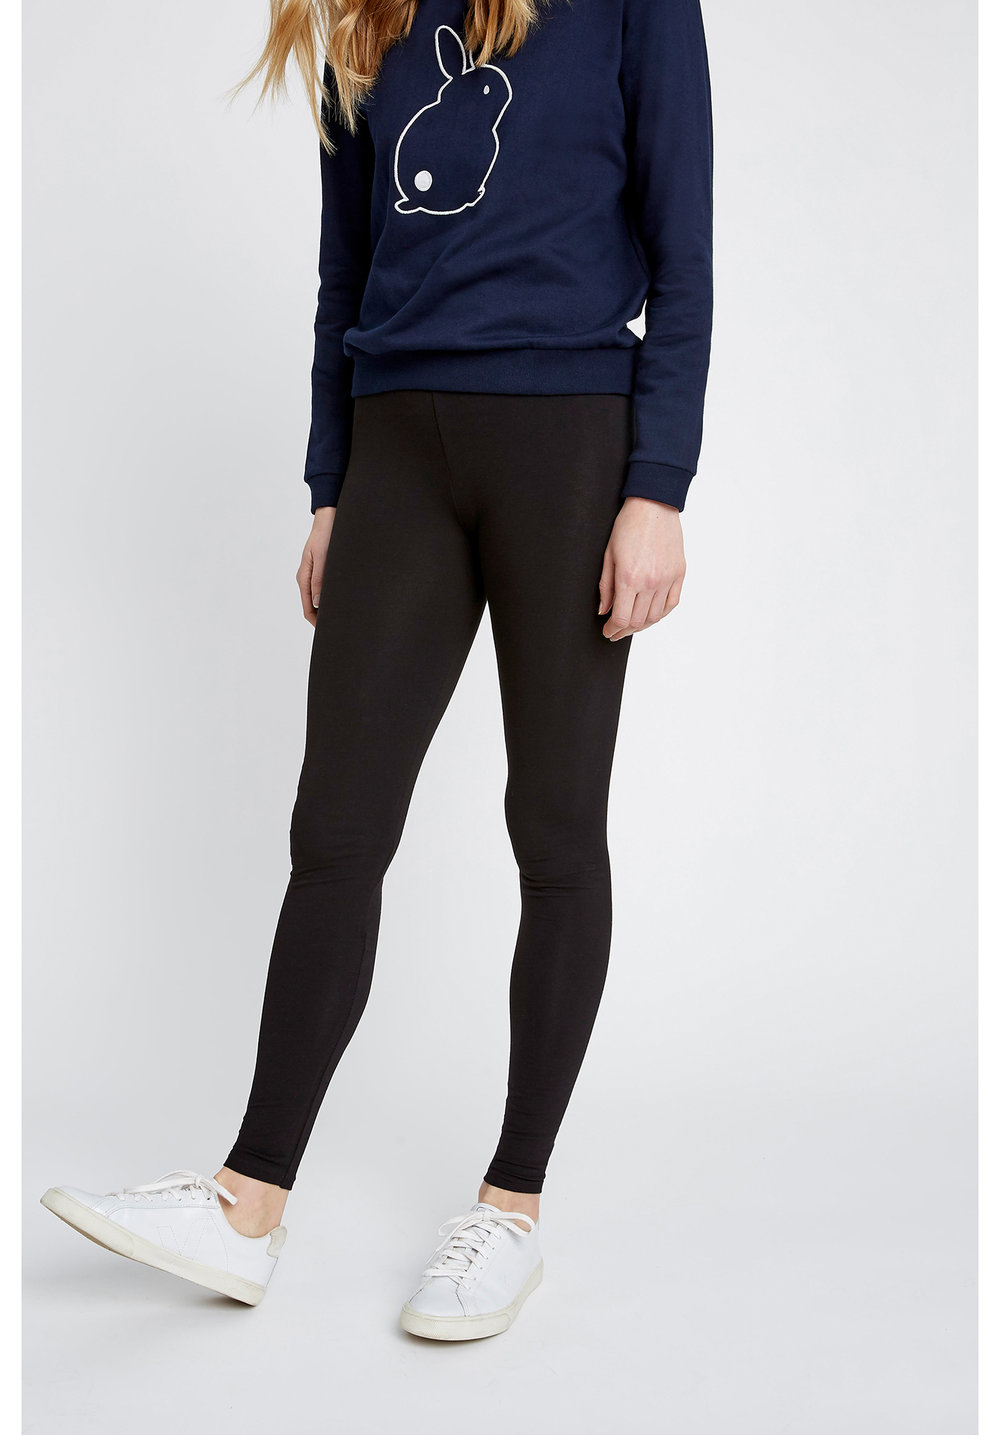 fair trade organic cotton leggings